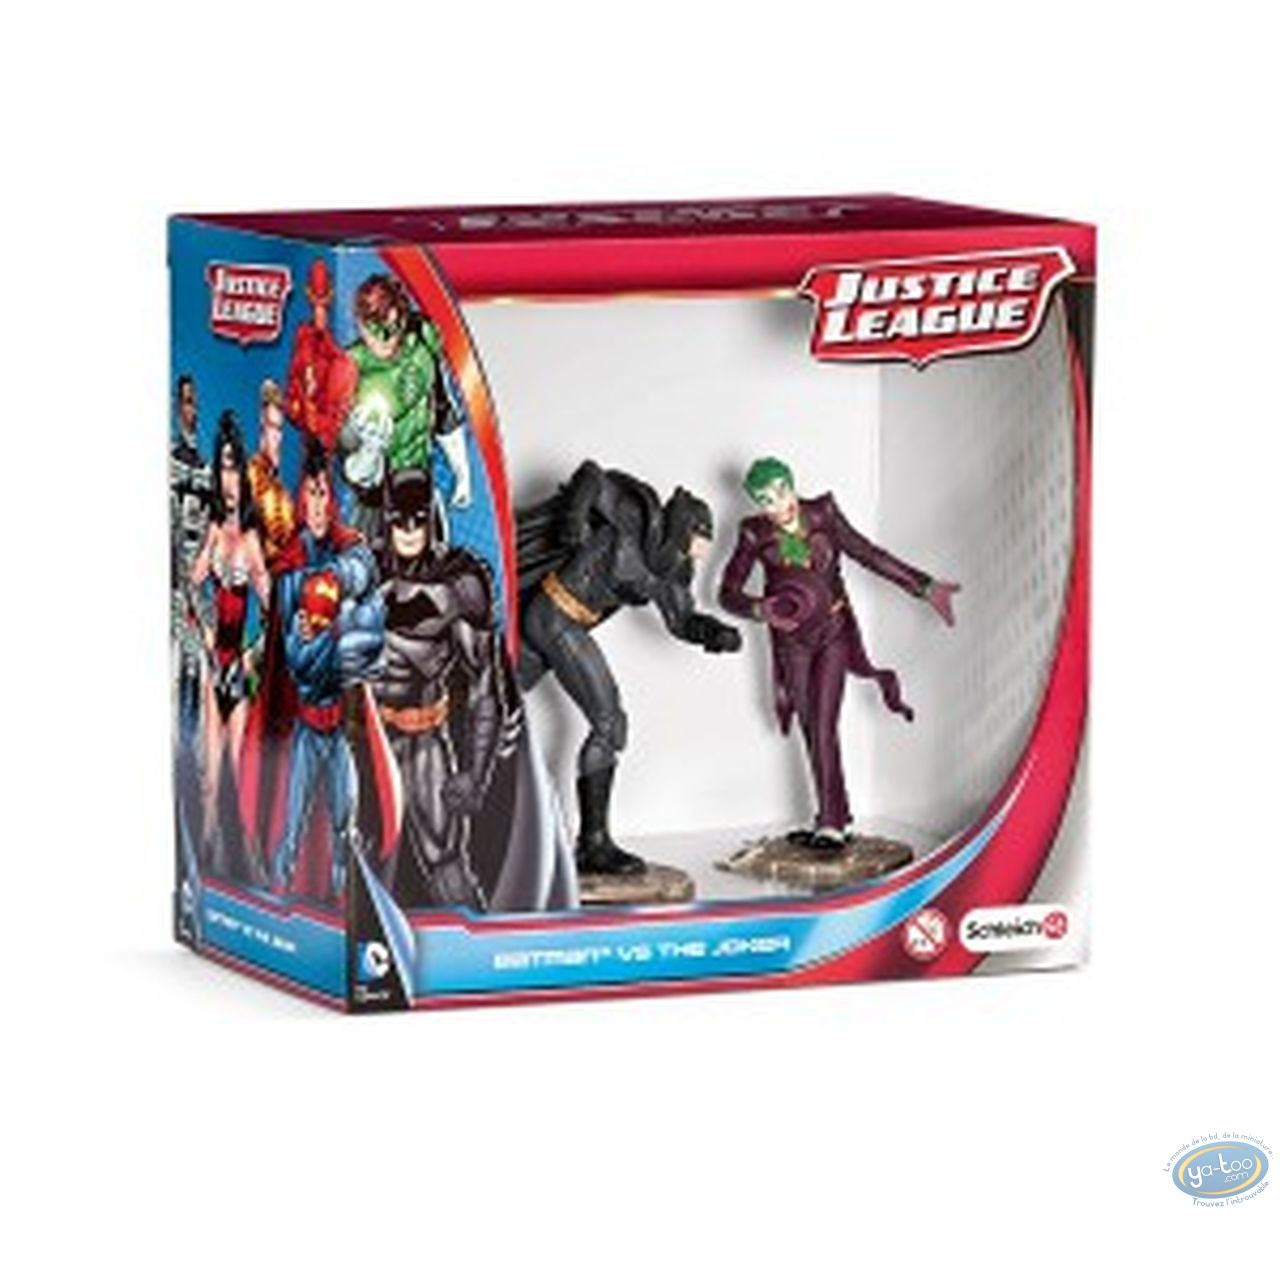 PVC Statuette, Superman : Scenery pack Batman Vs Joker